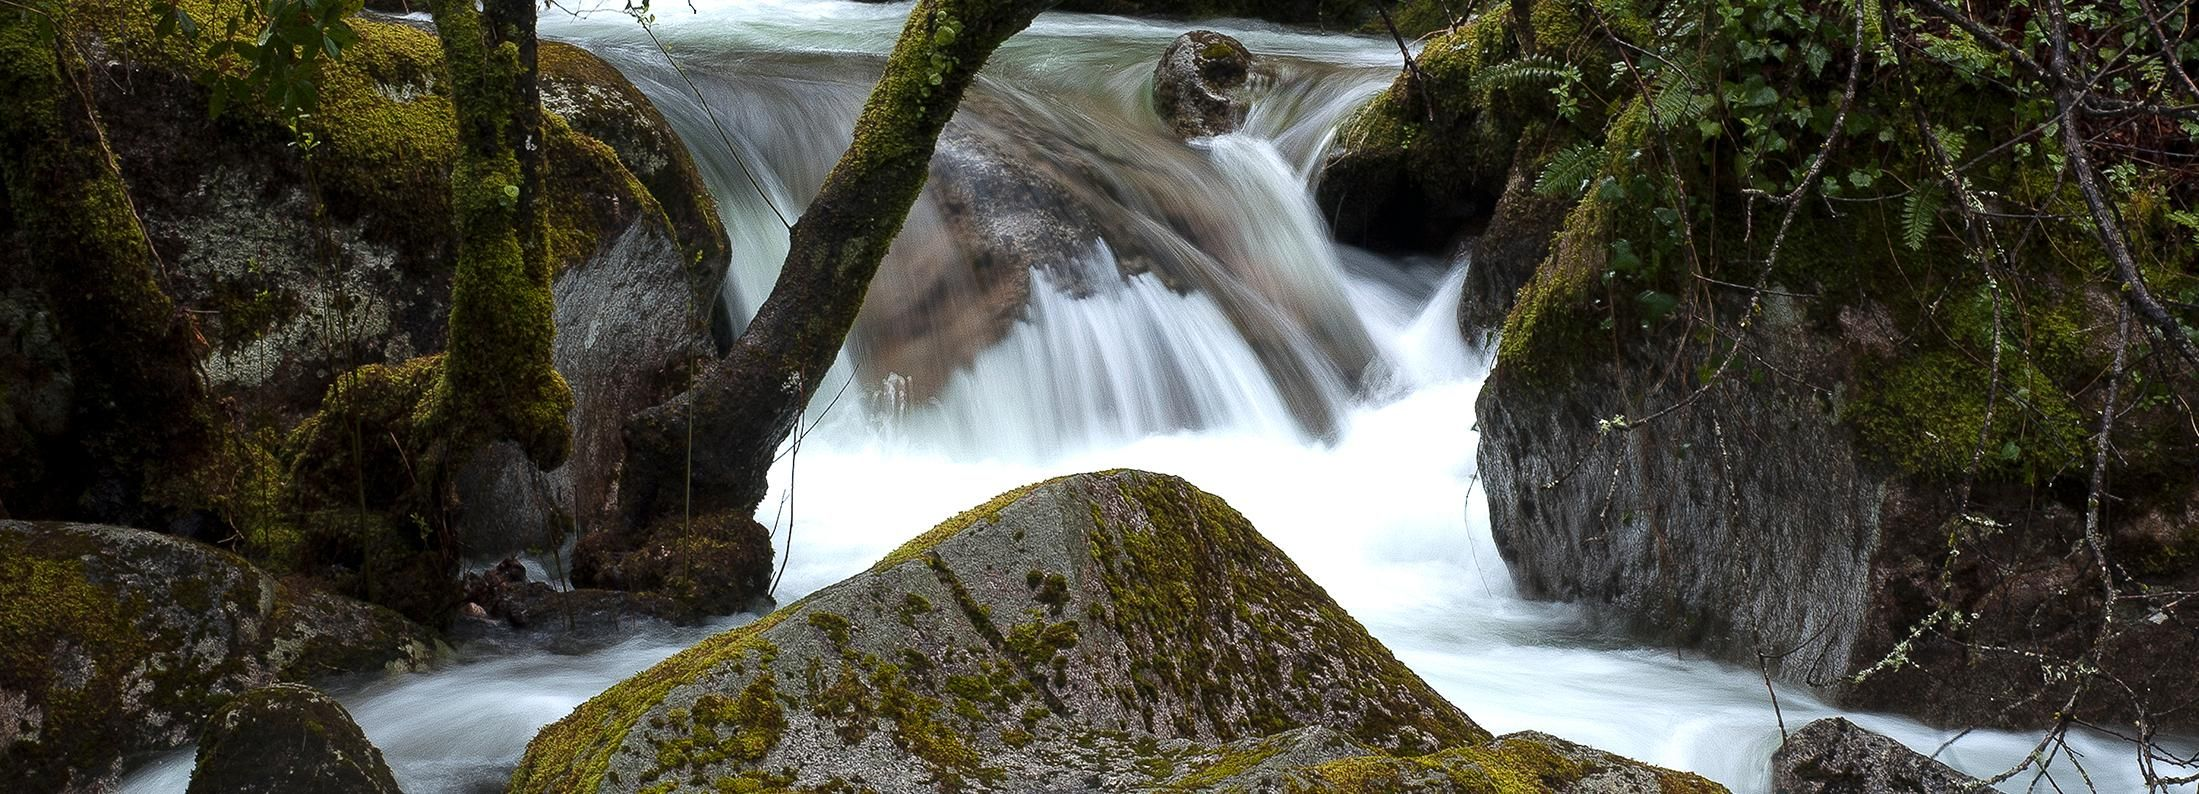 Peneda-Gerês National Park Full-Day Tour